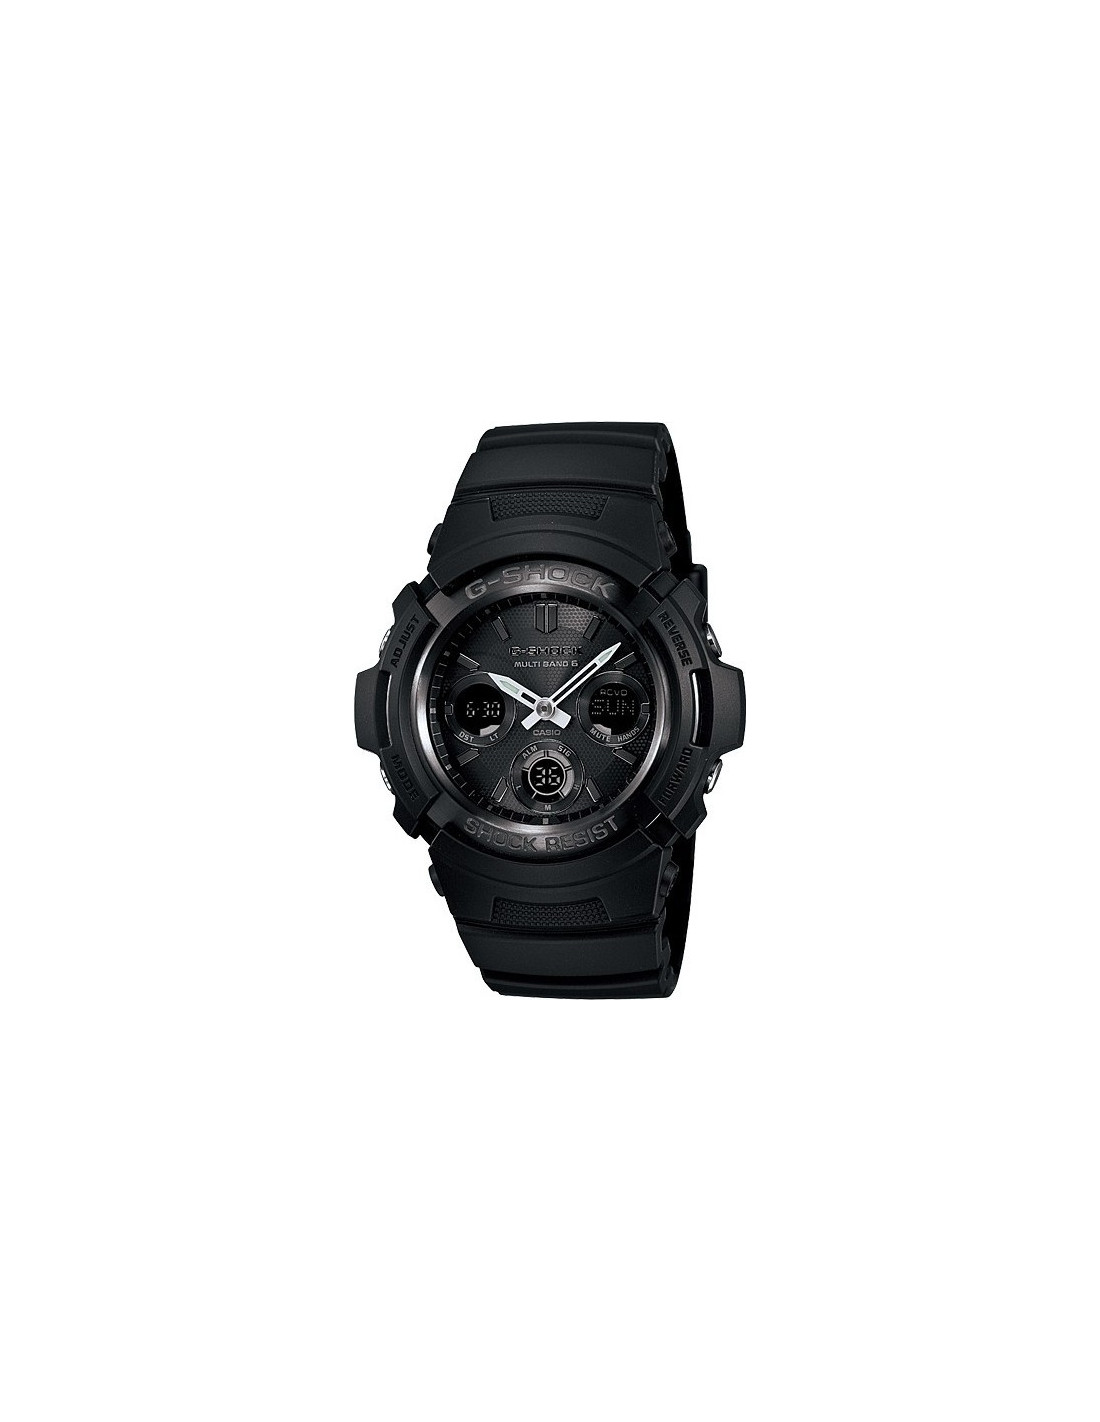 Montre Homme Casio G Shock AWG M100B 1AER Noir à 119,00  3Kuyl